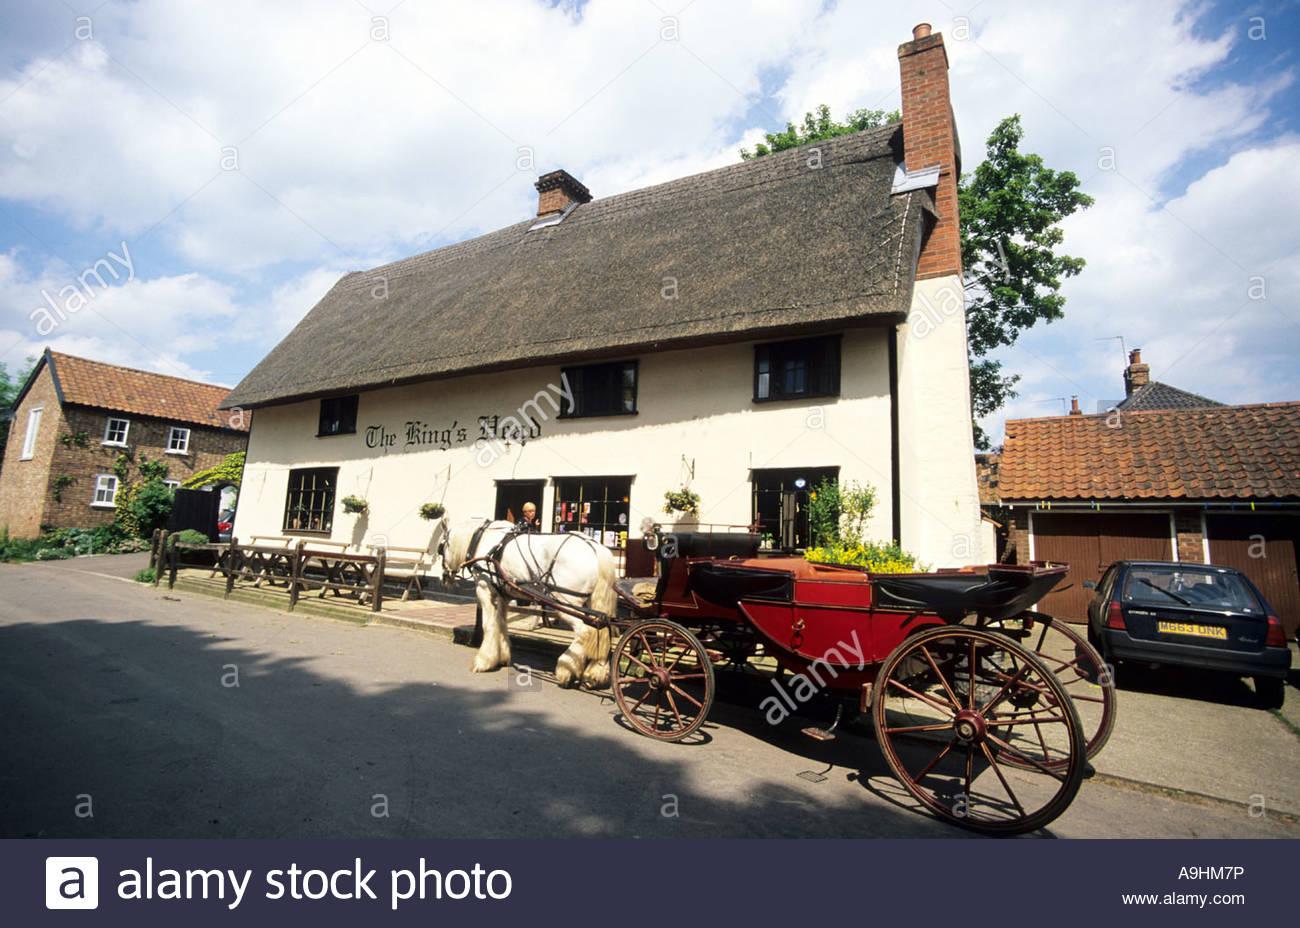 Laxfield, Kings, Head, Pub, Bar, Horse, Carrage, Suffolk, England Stock Photo